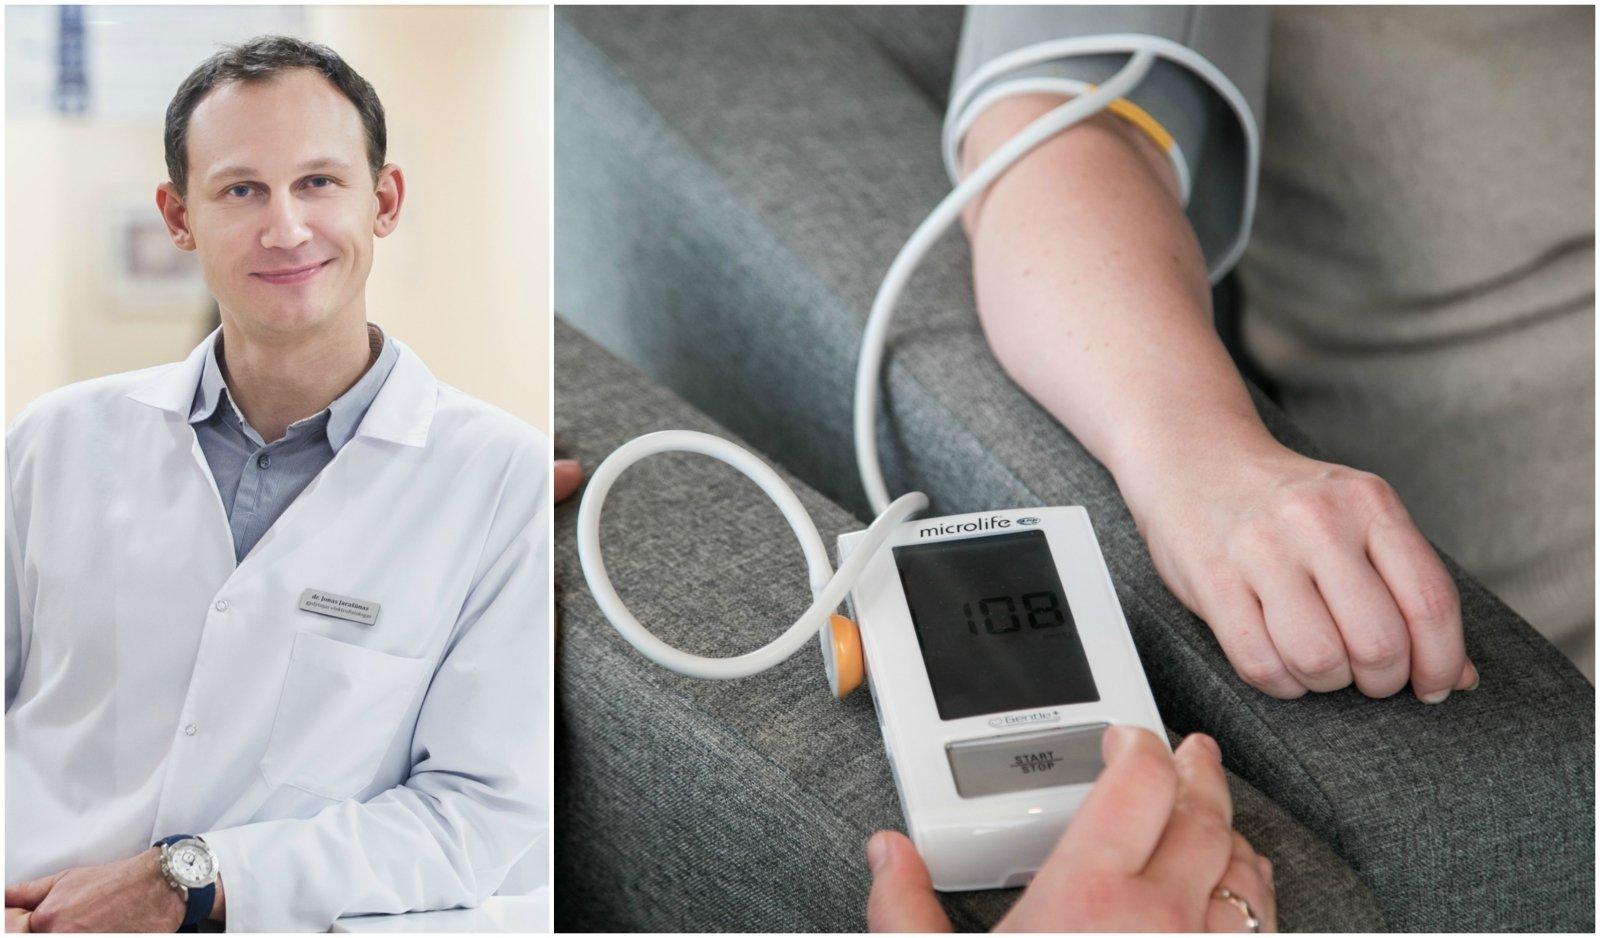 hipertenzija, kuris serga